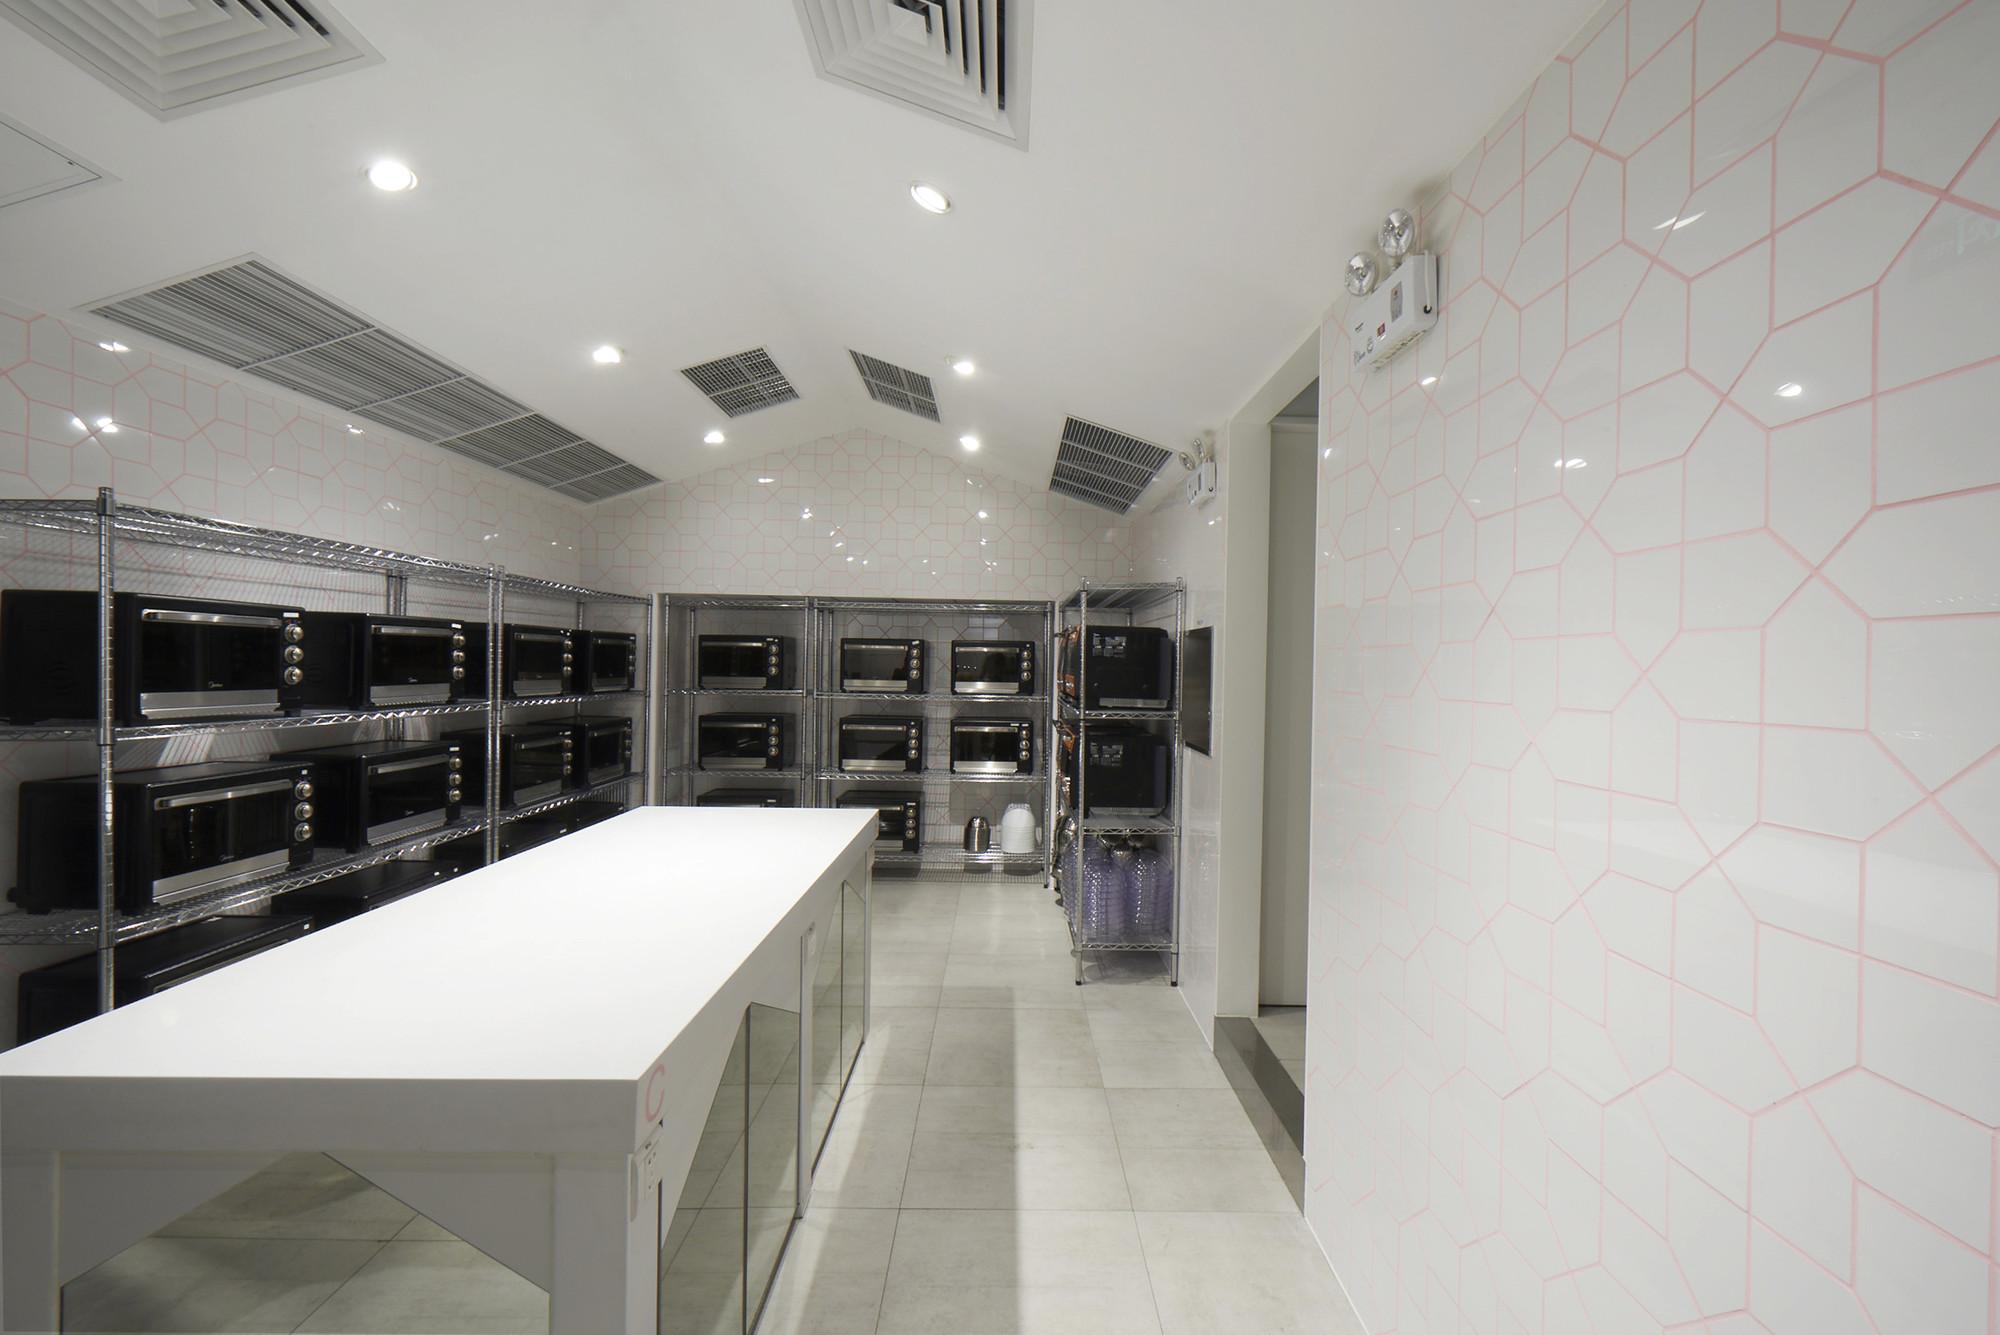 Gallery of abc cooking studio prism design 11 for Studio 11 architecture